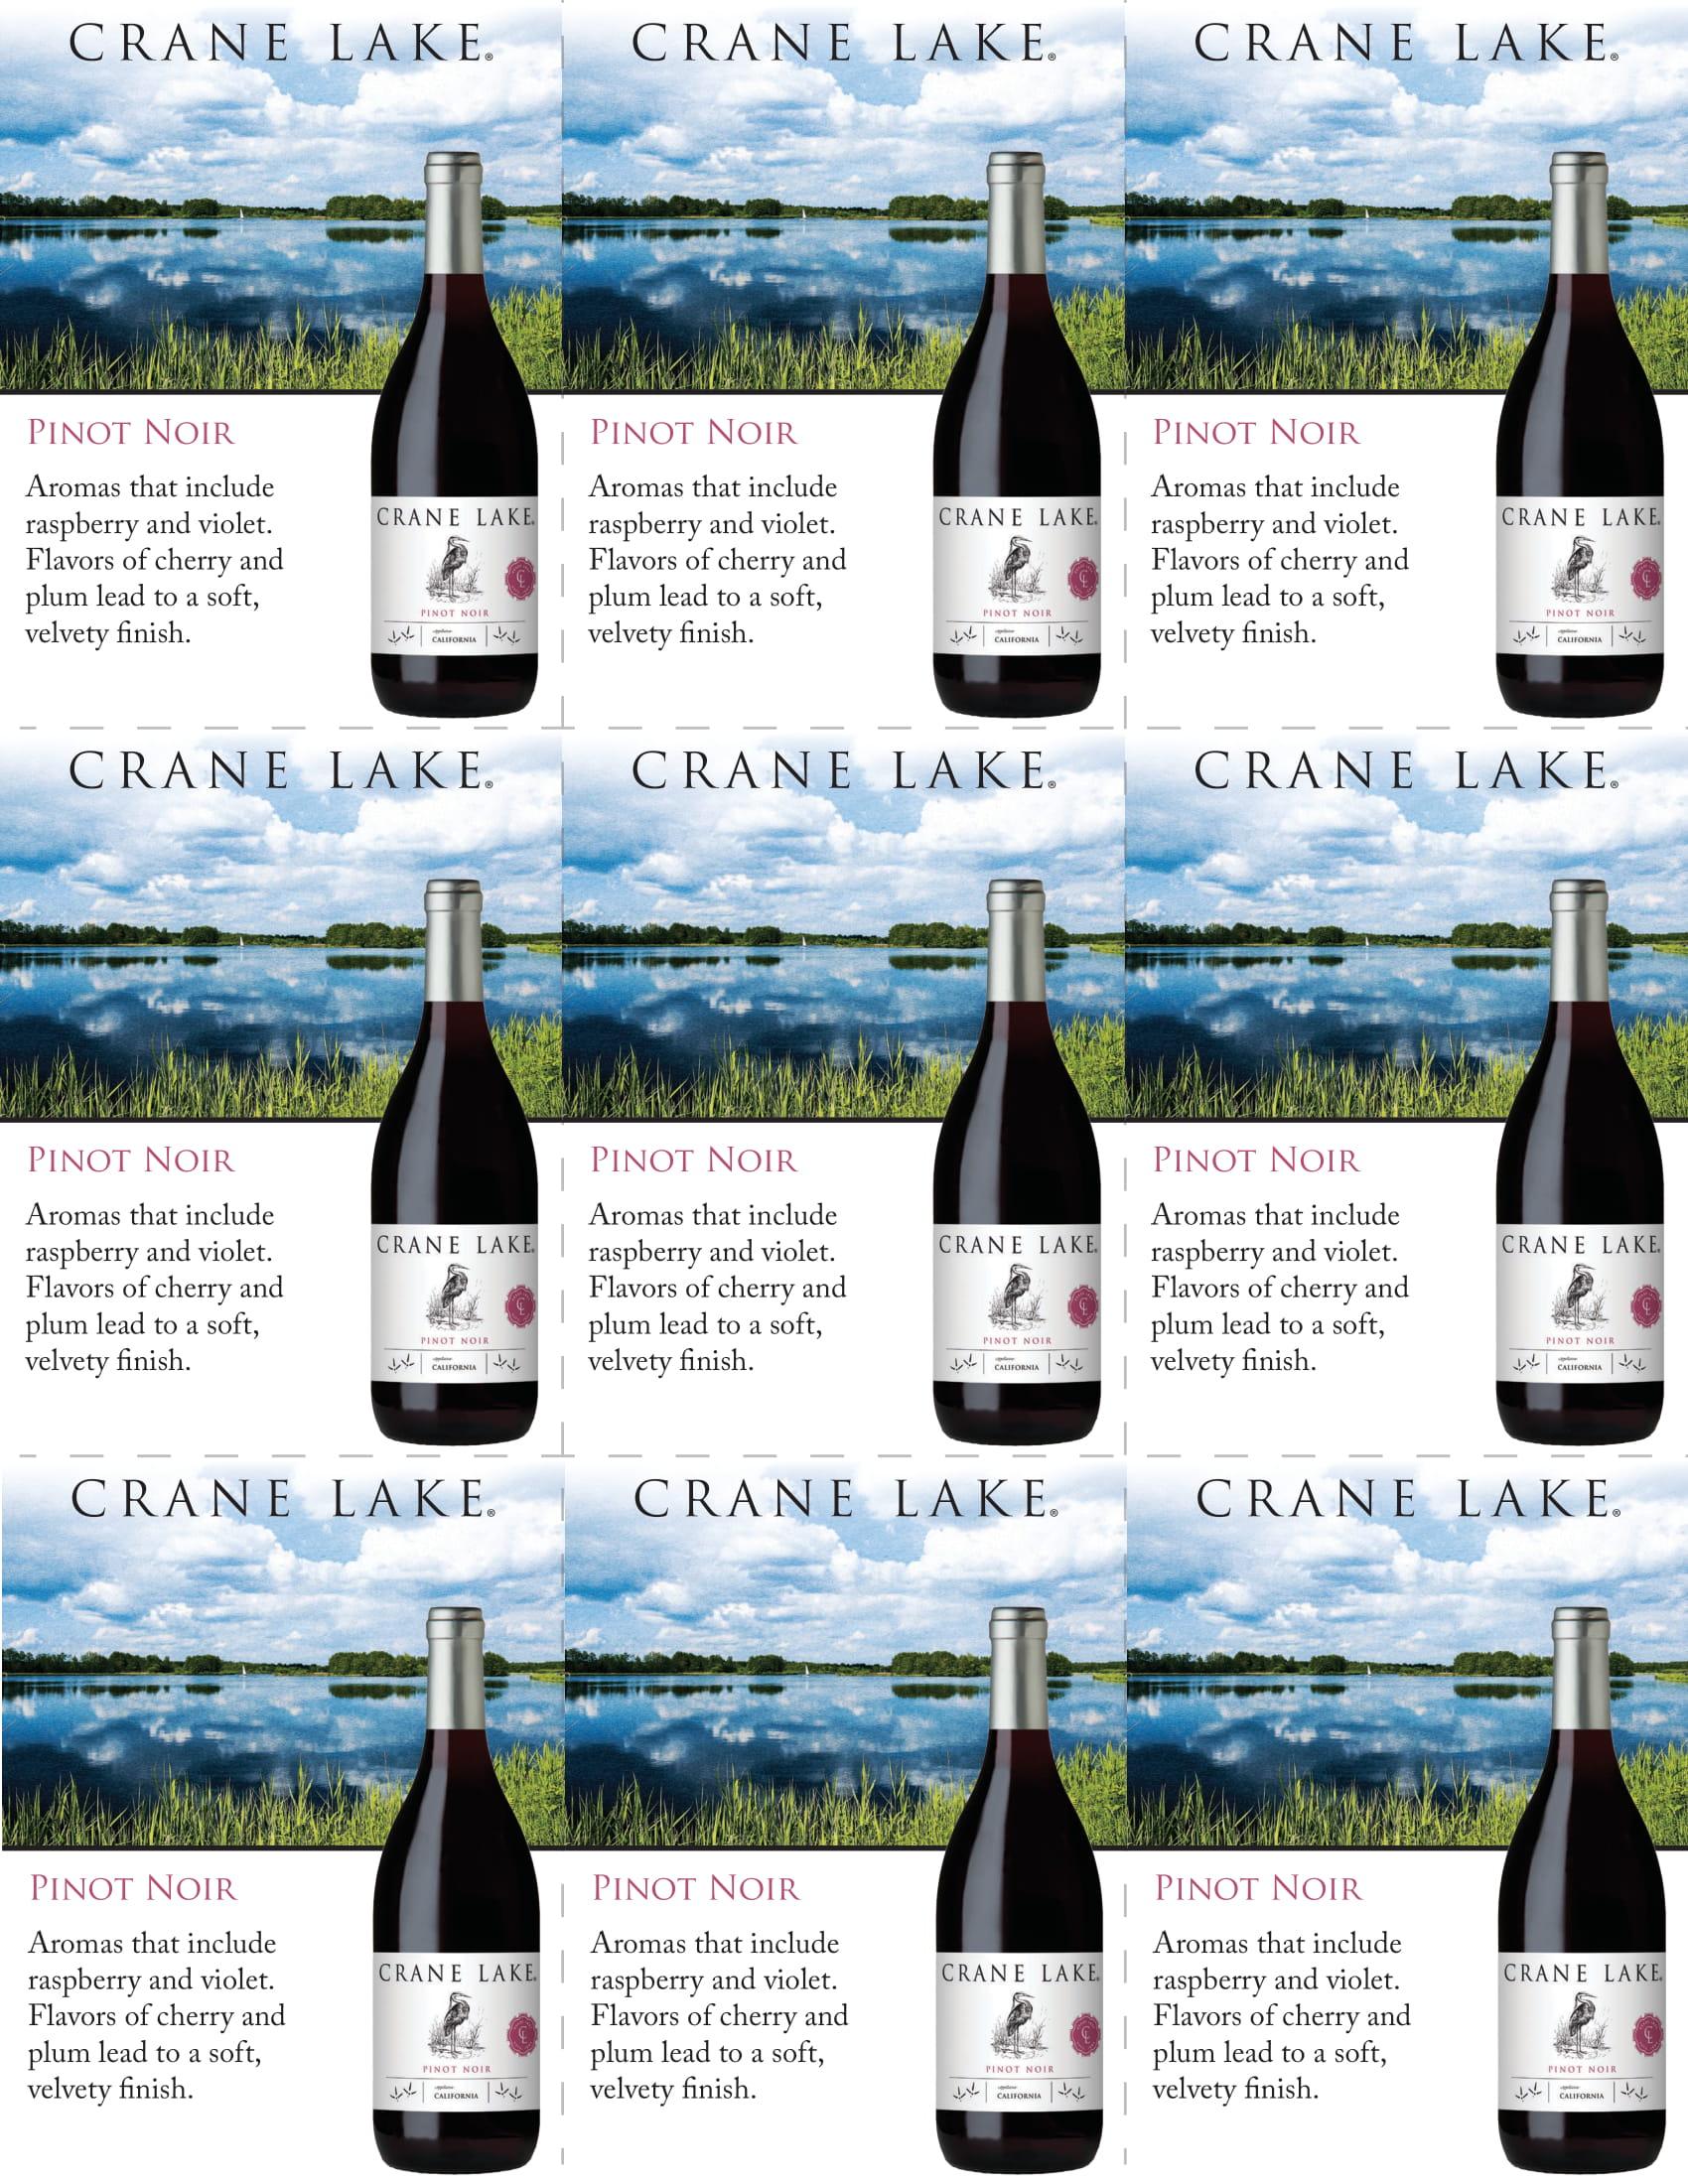 Crane Lake Pinot Noir Shelf Talkers